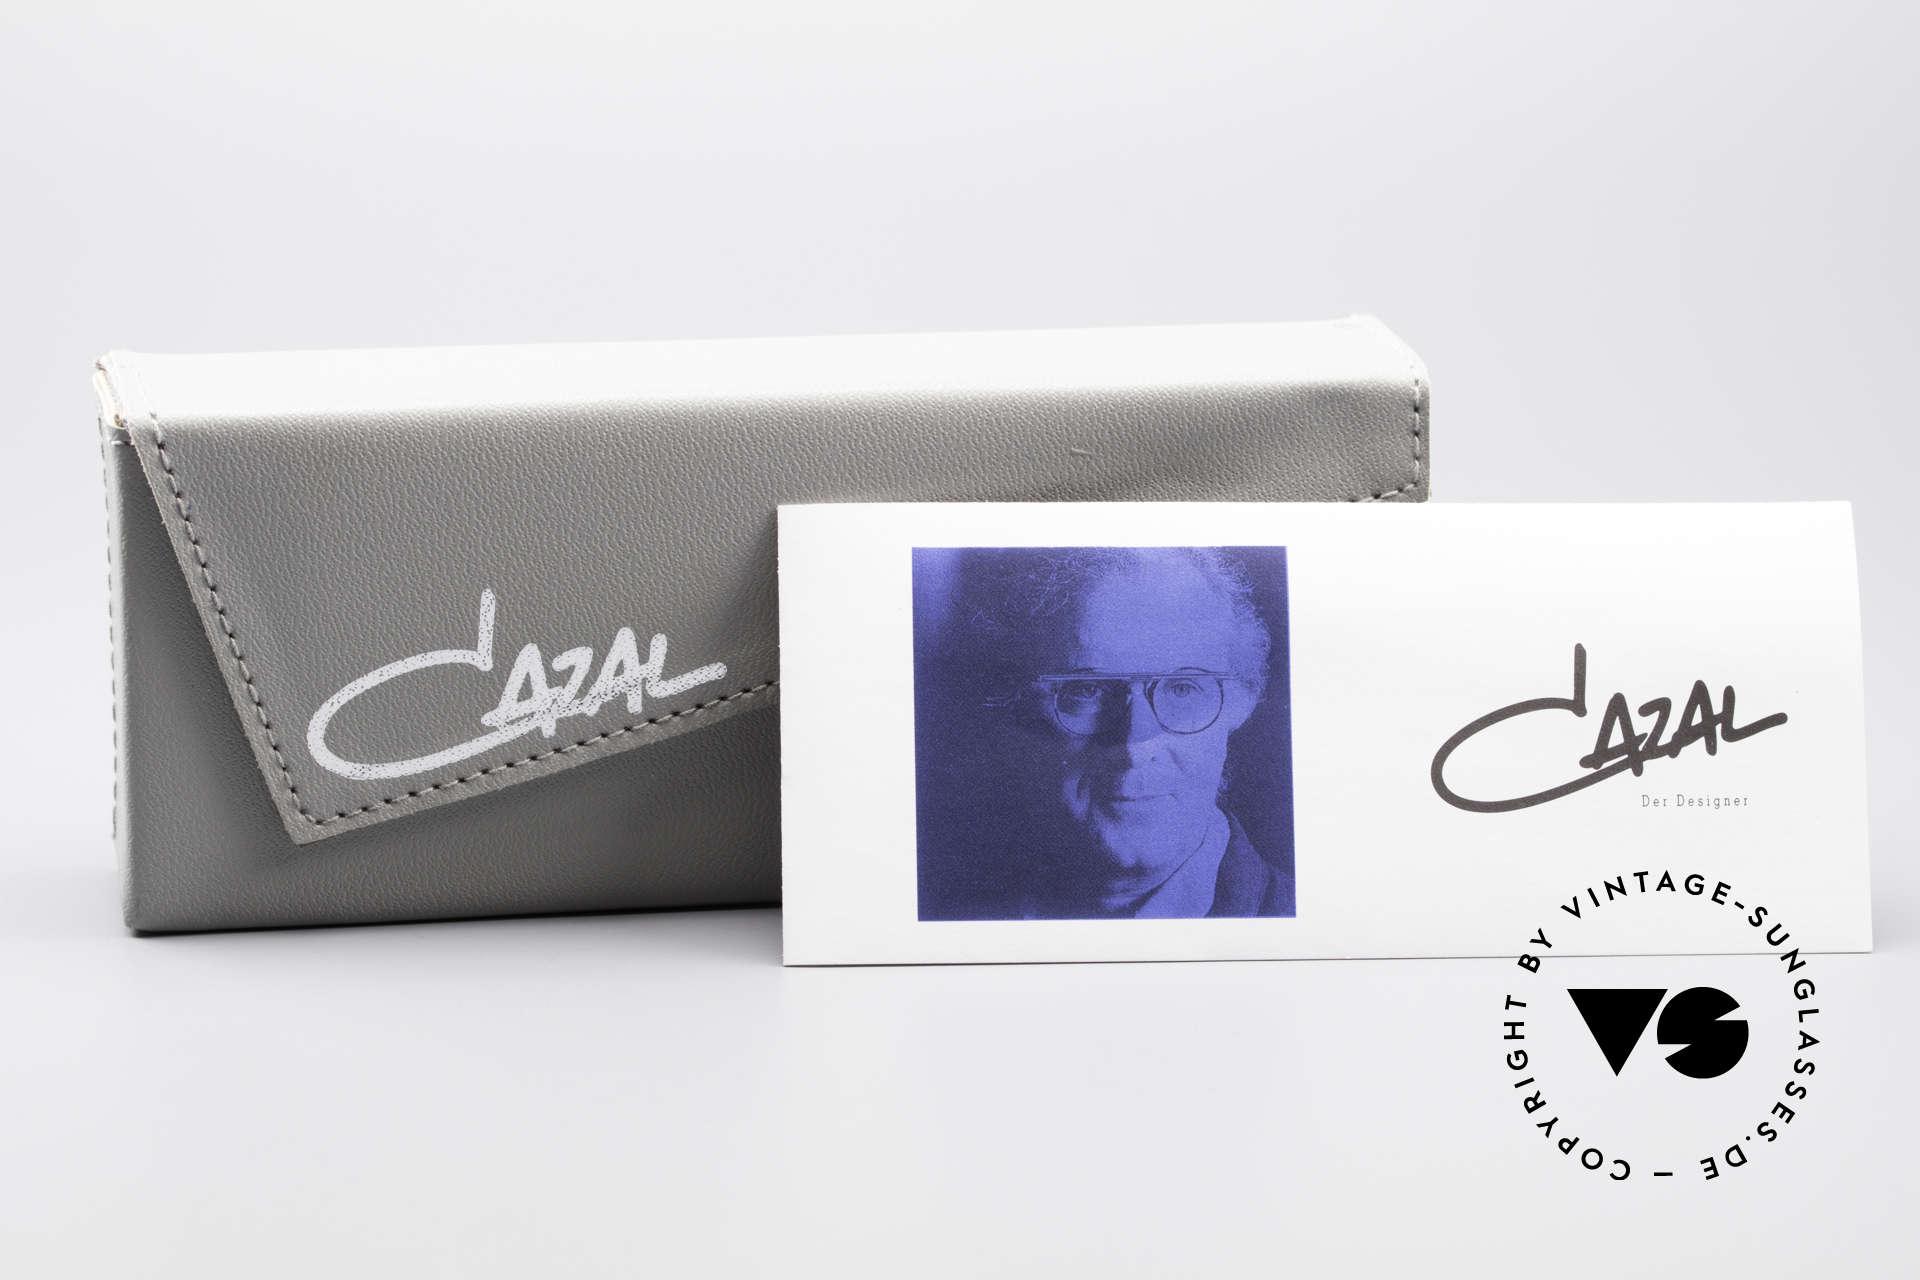 Cazal 732 80's West Germany Eyeglasses, Size: medium, Made for Men